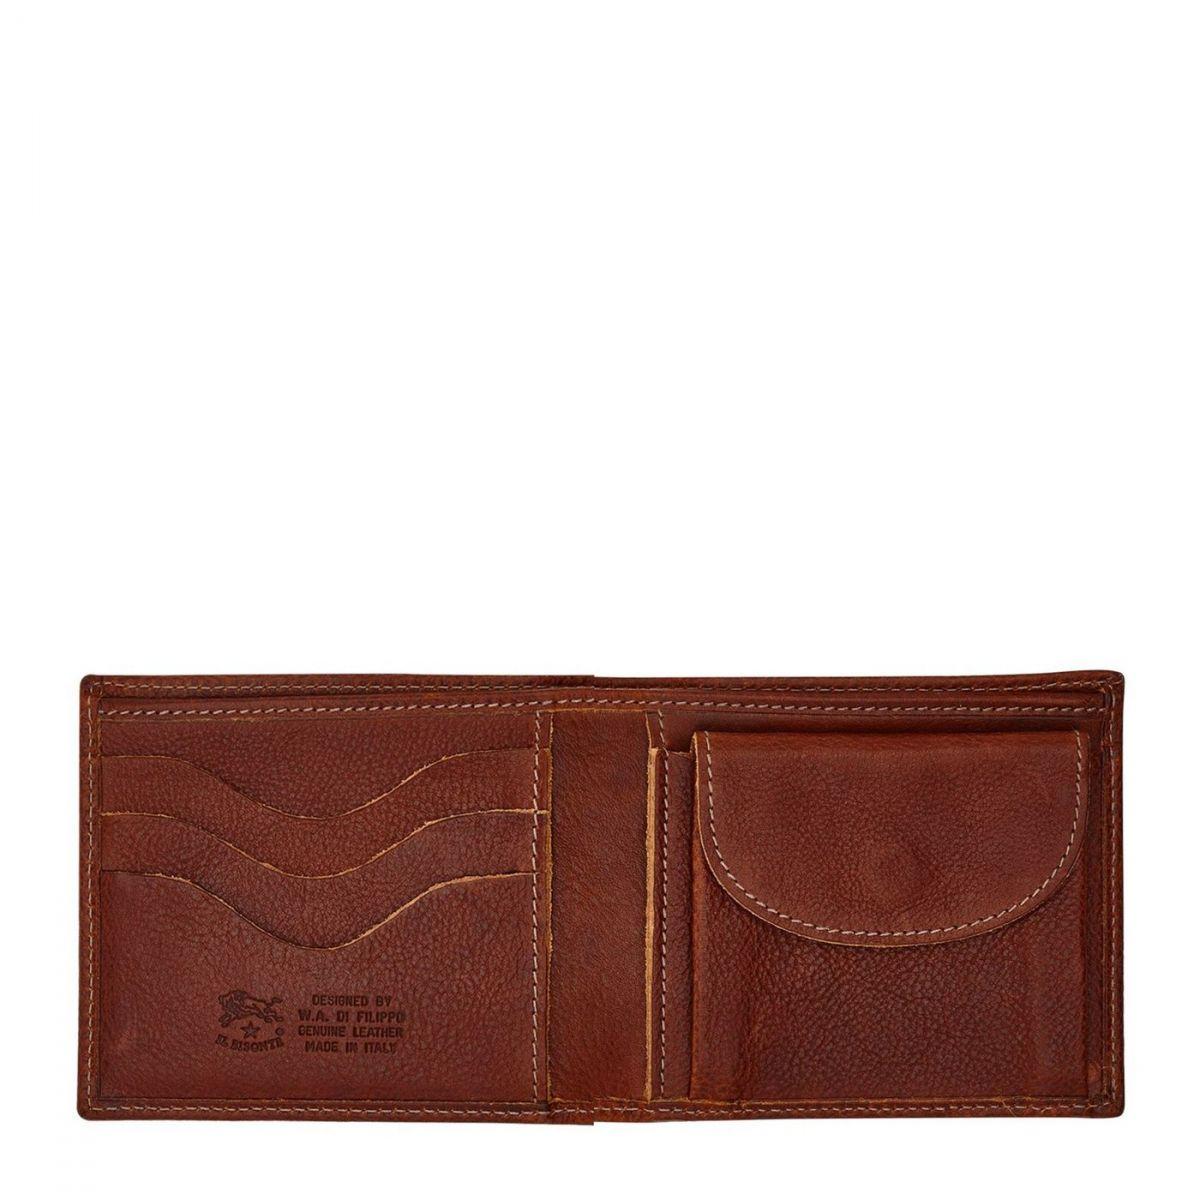 Men's Bi-Fold Wallet in Vintage Cowhide Leather SBW007 color Dark Brown Seppia | Details